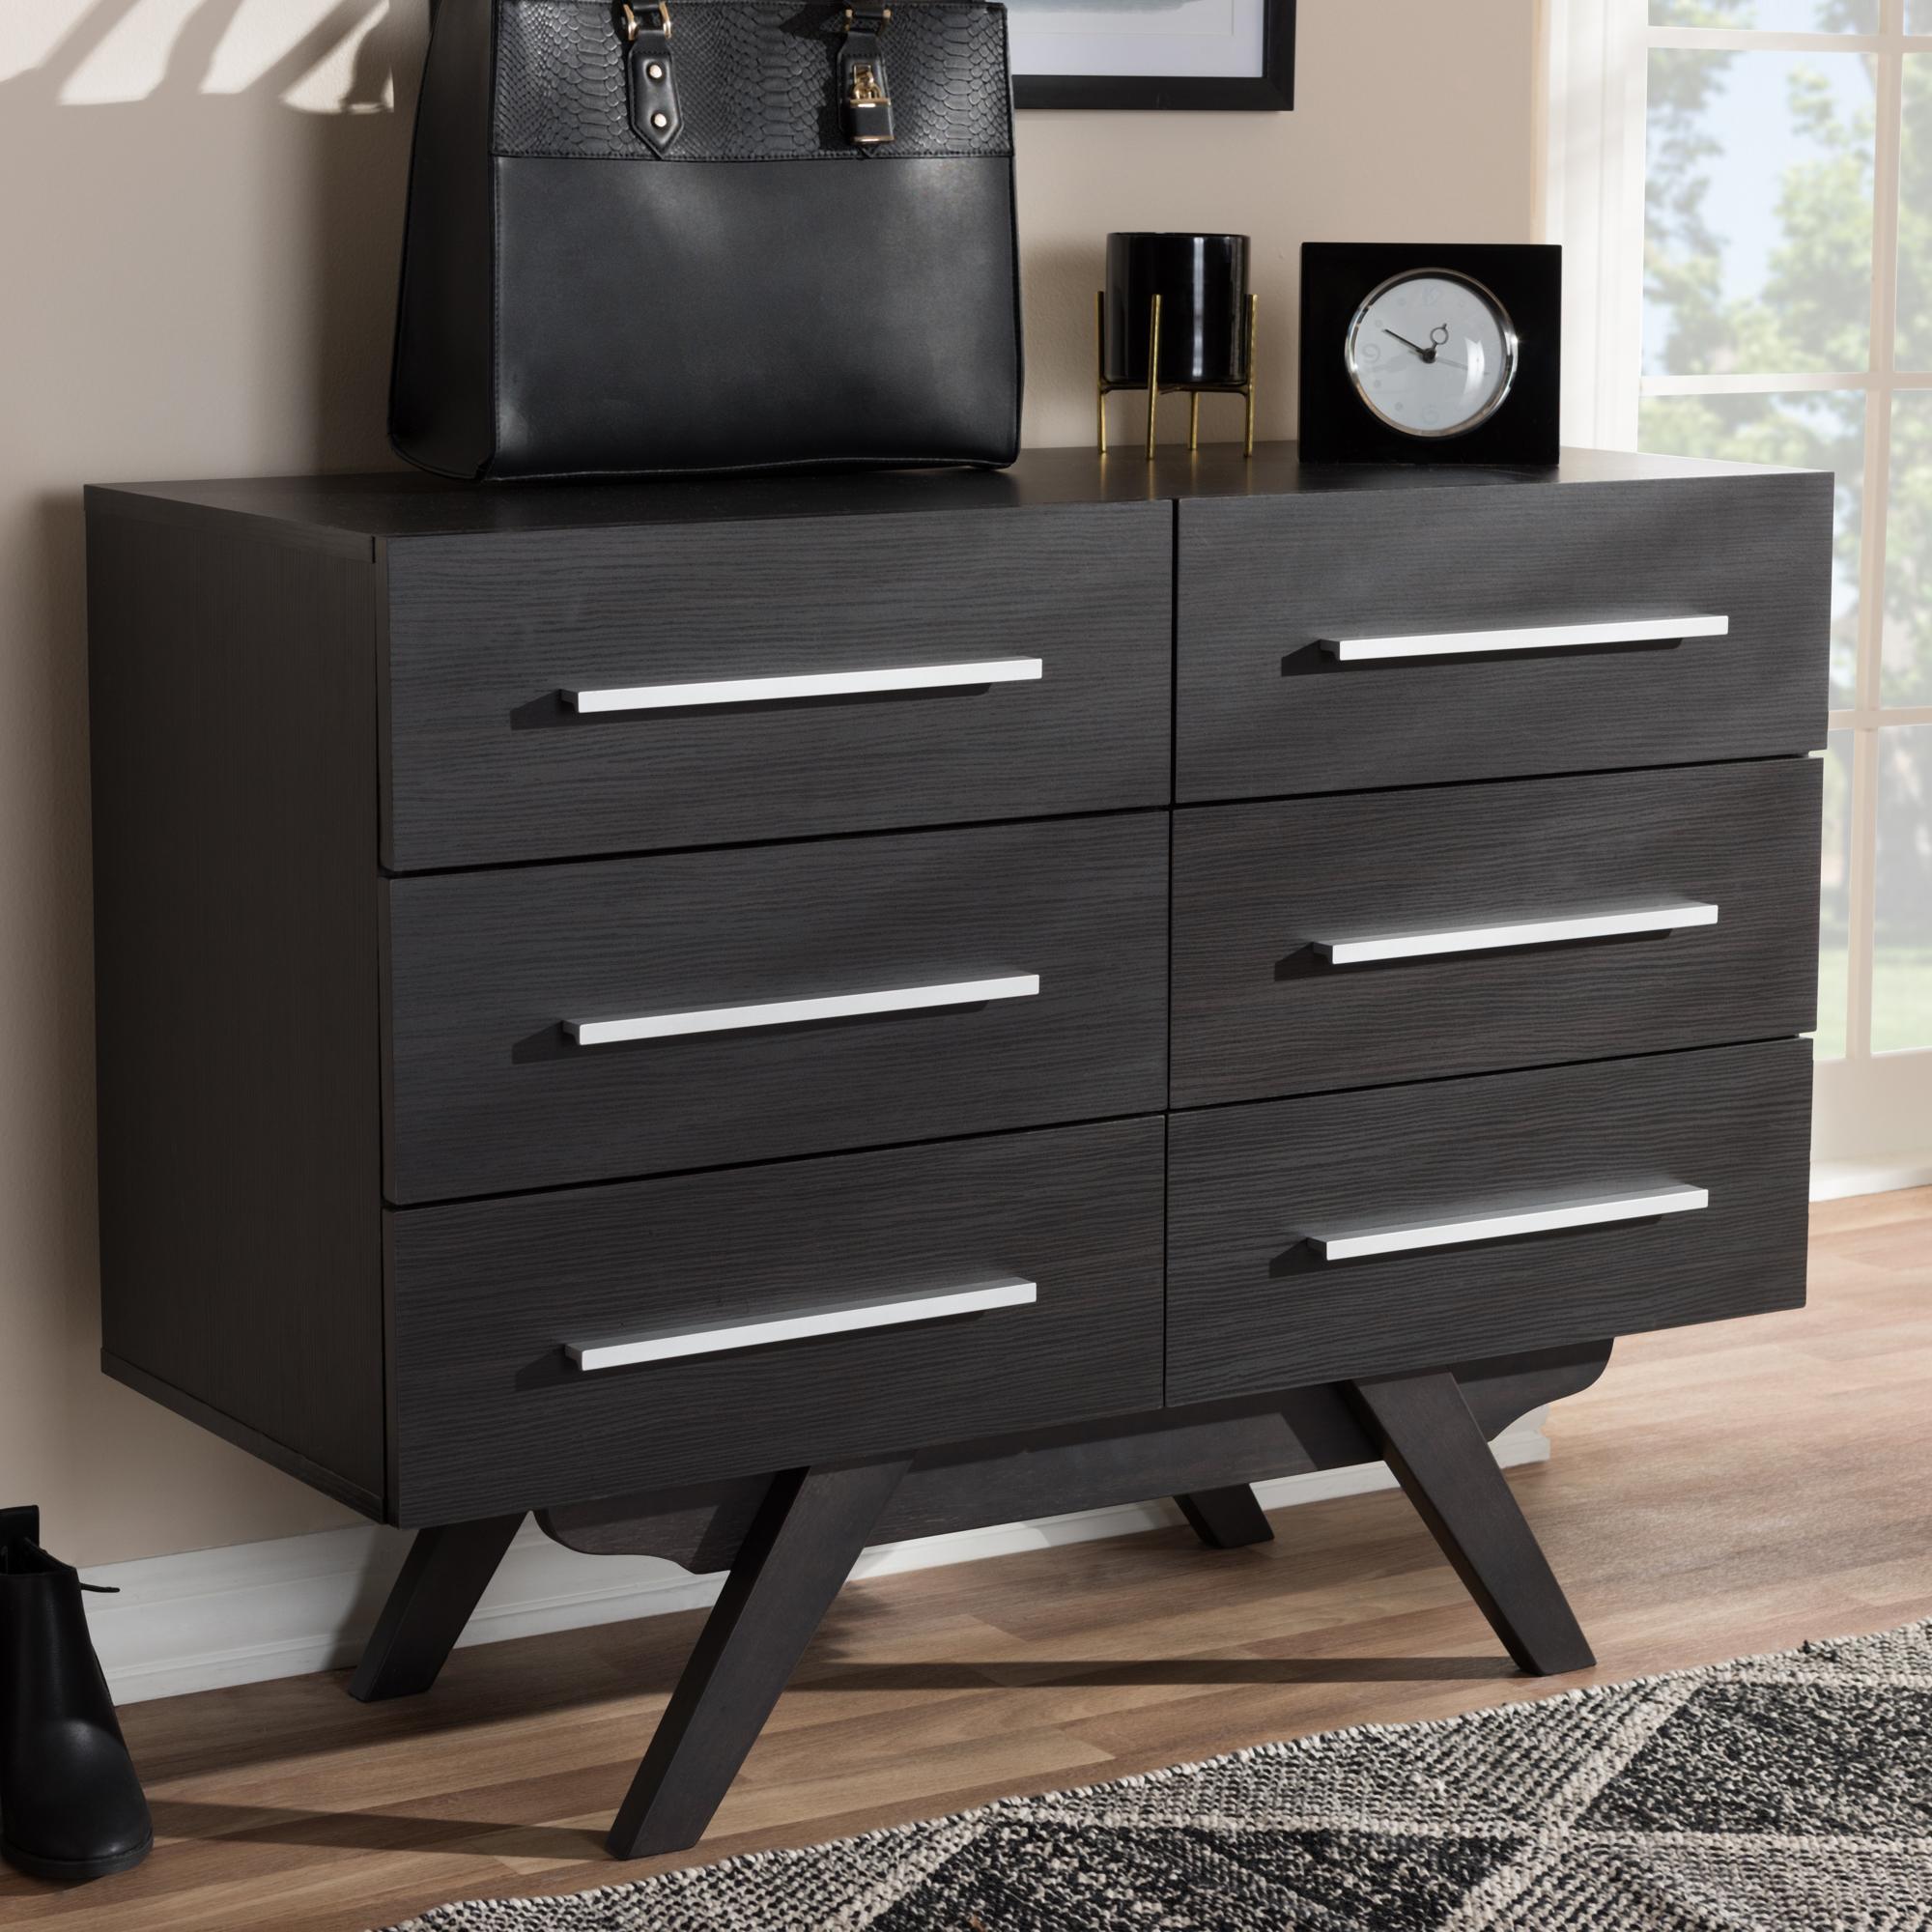 ... Baxton Studio Auburn Mid Century Modern Espresso Brown Finished Wood 6 Drawer  Dresser ...